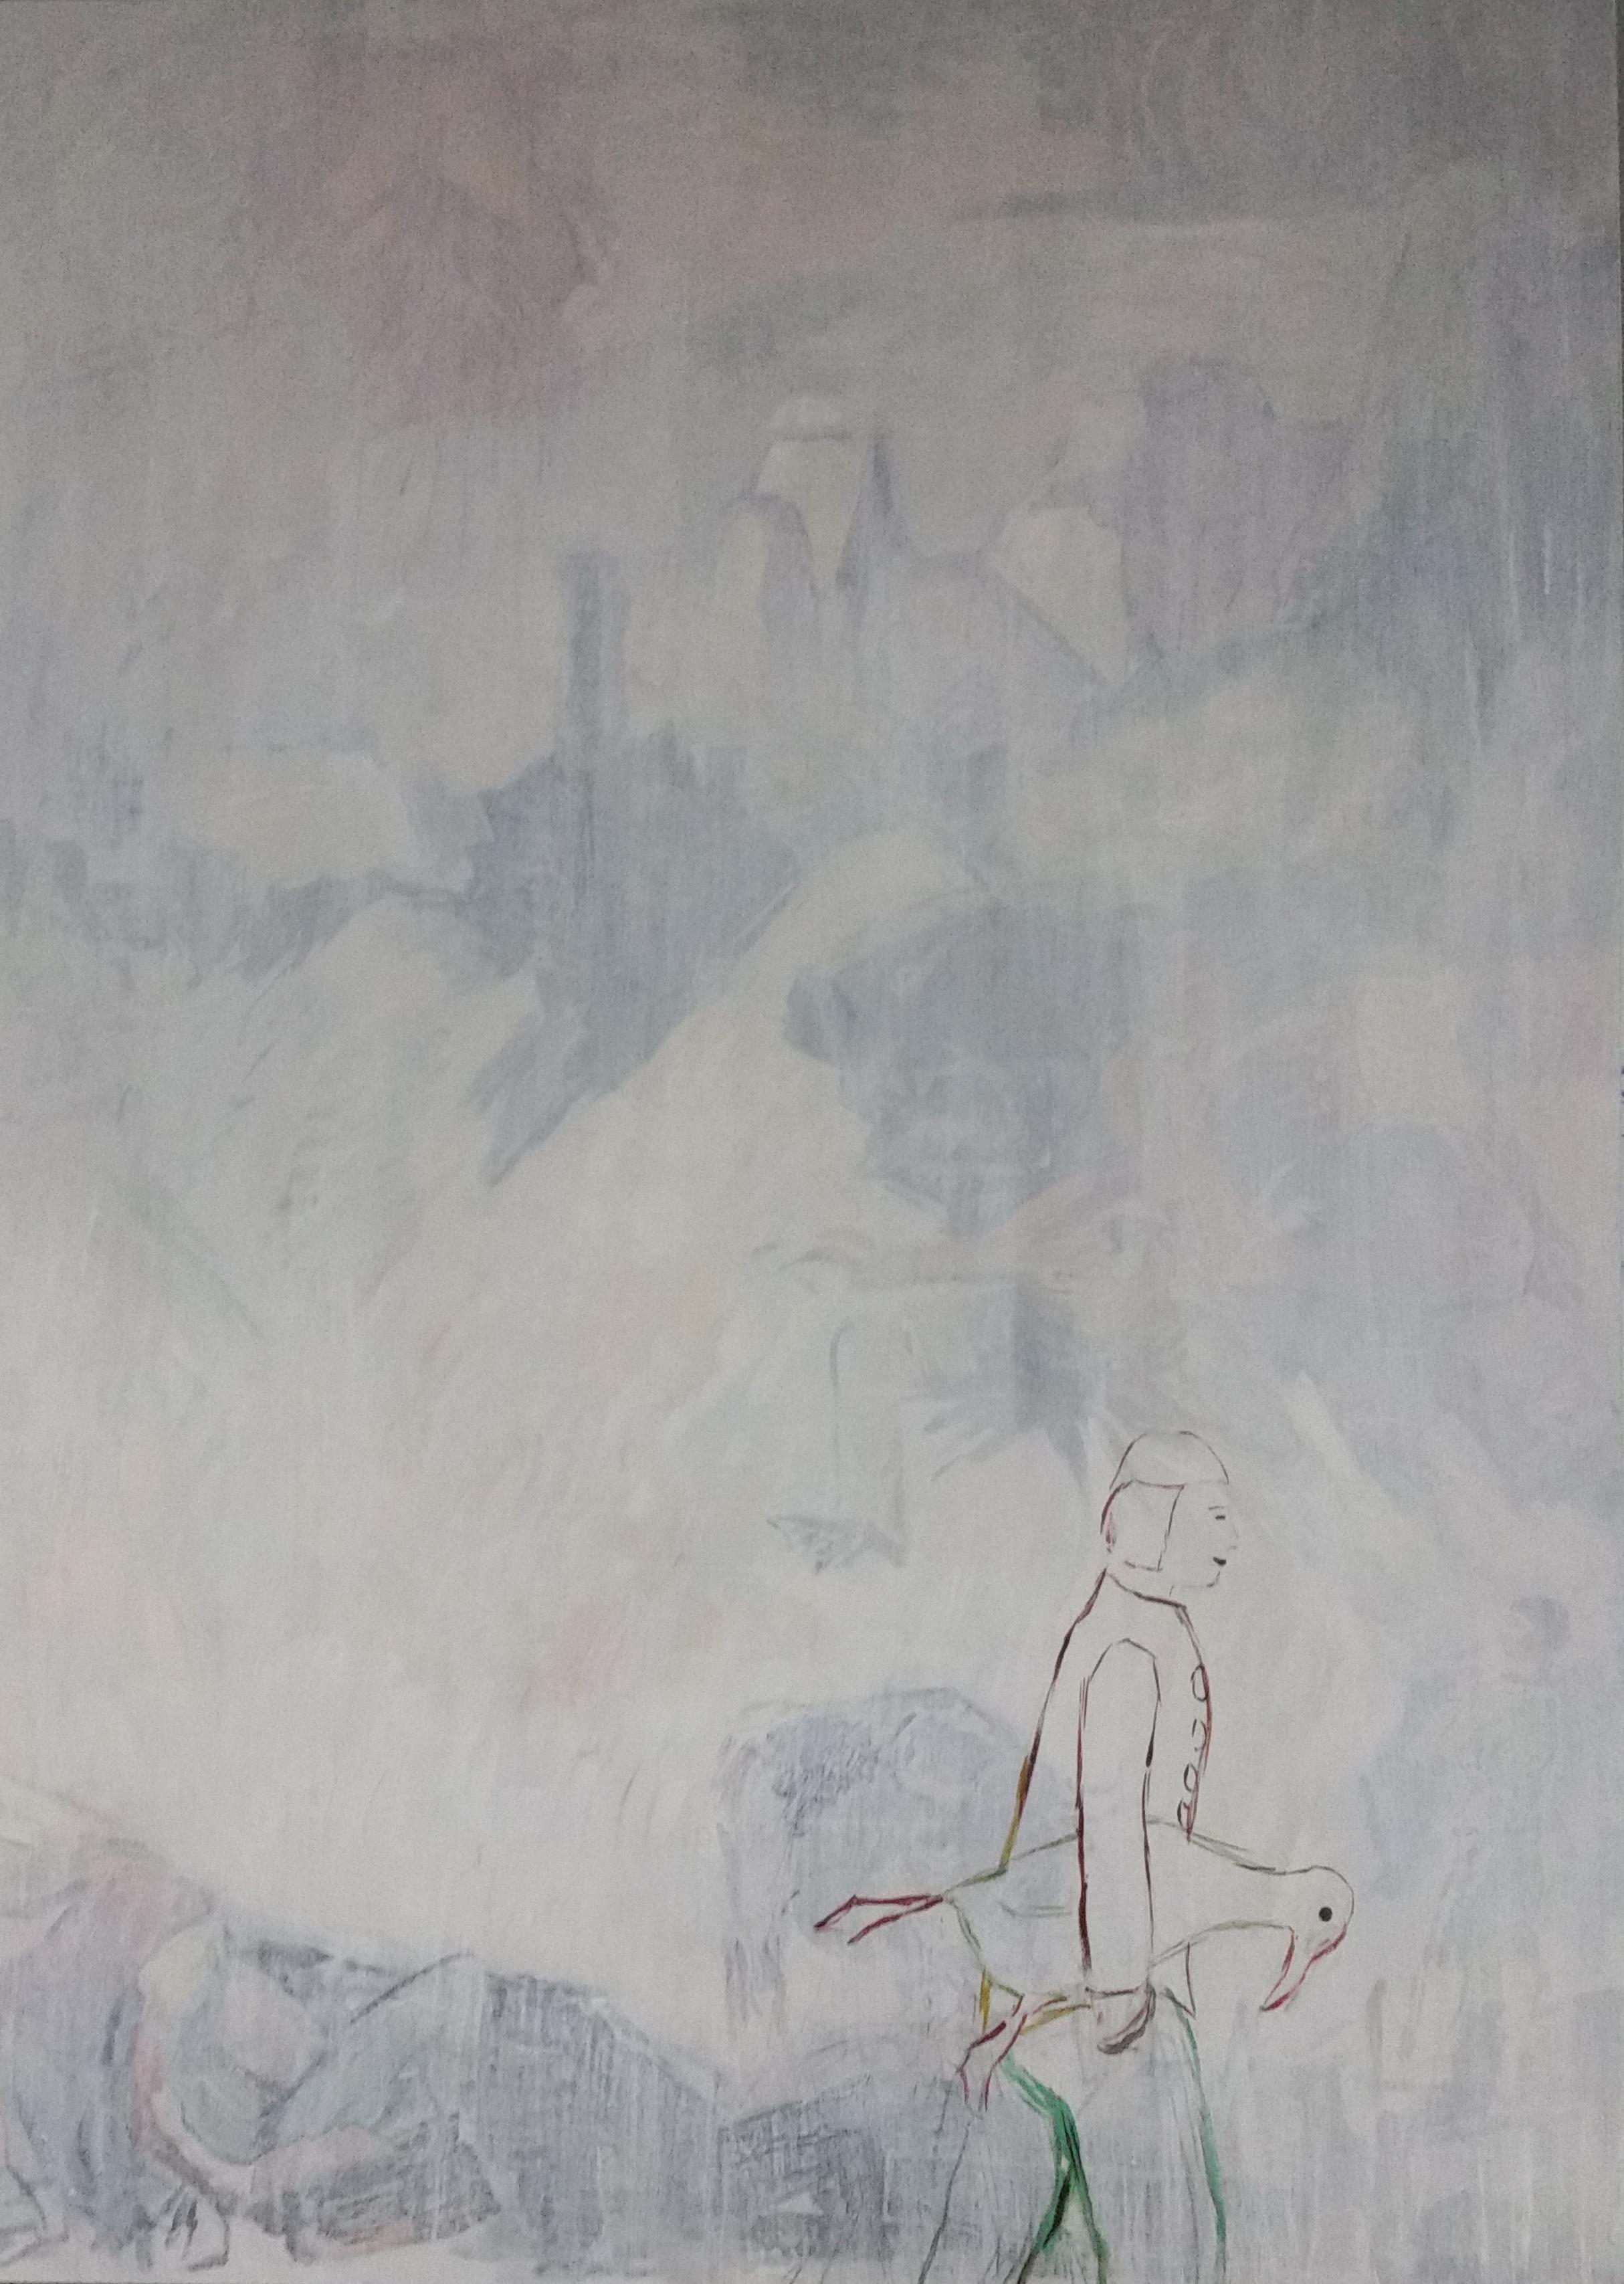 Nebel , 2015 Mixed media on canvas 213 x 152 cm